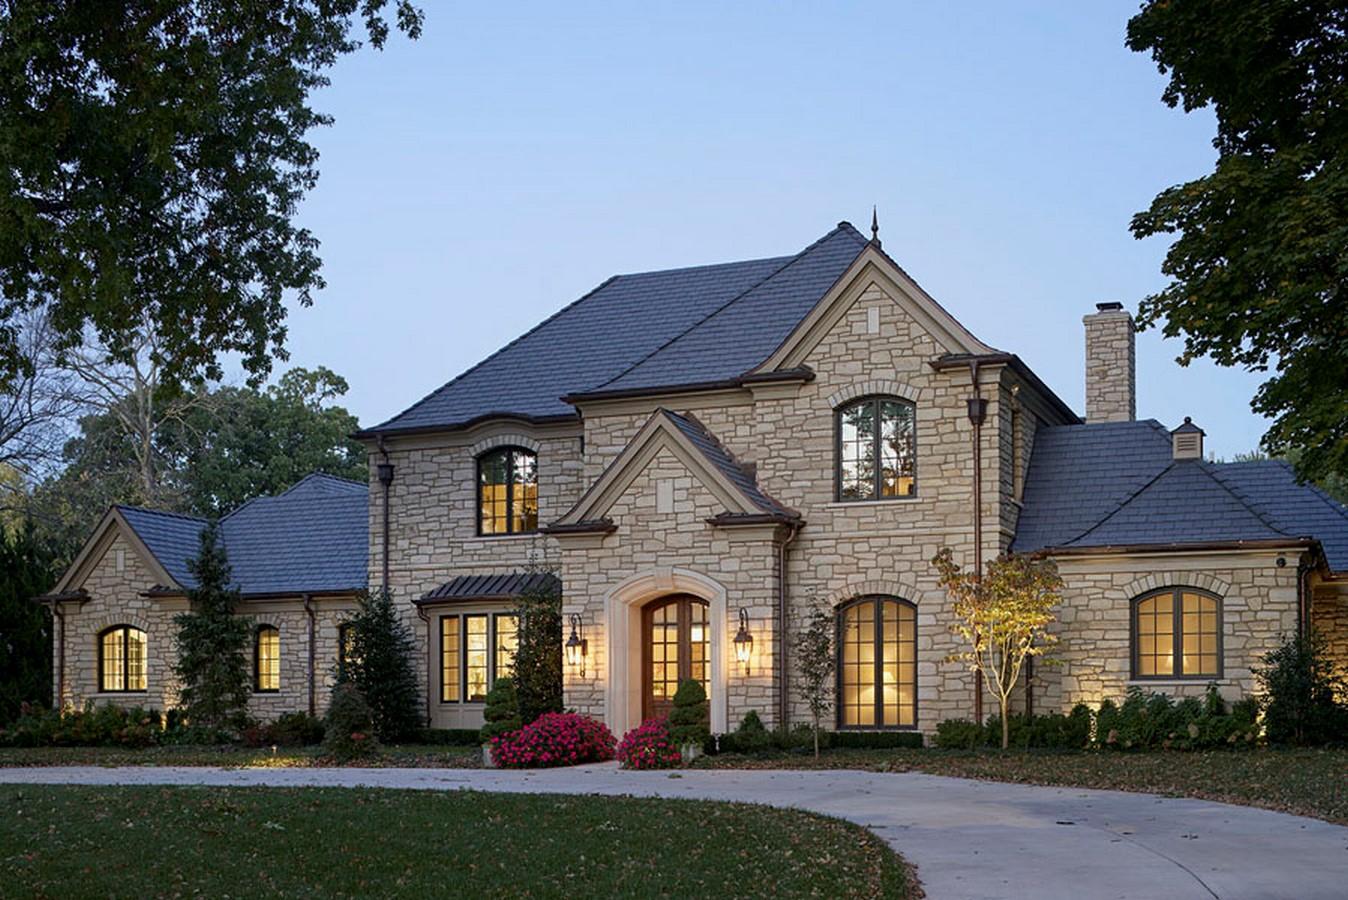 Architects in Kansas city - Top 90 Architects in Kansas city - Sheet63